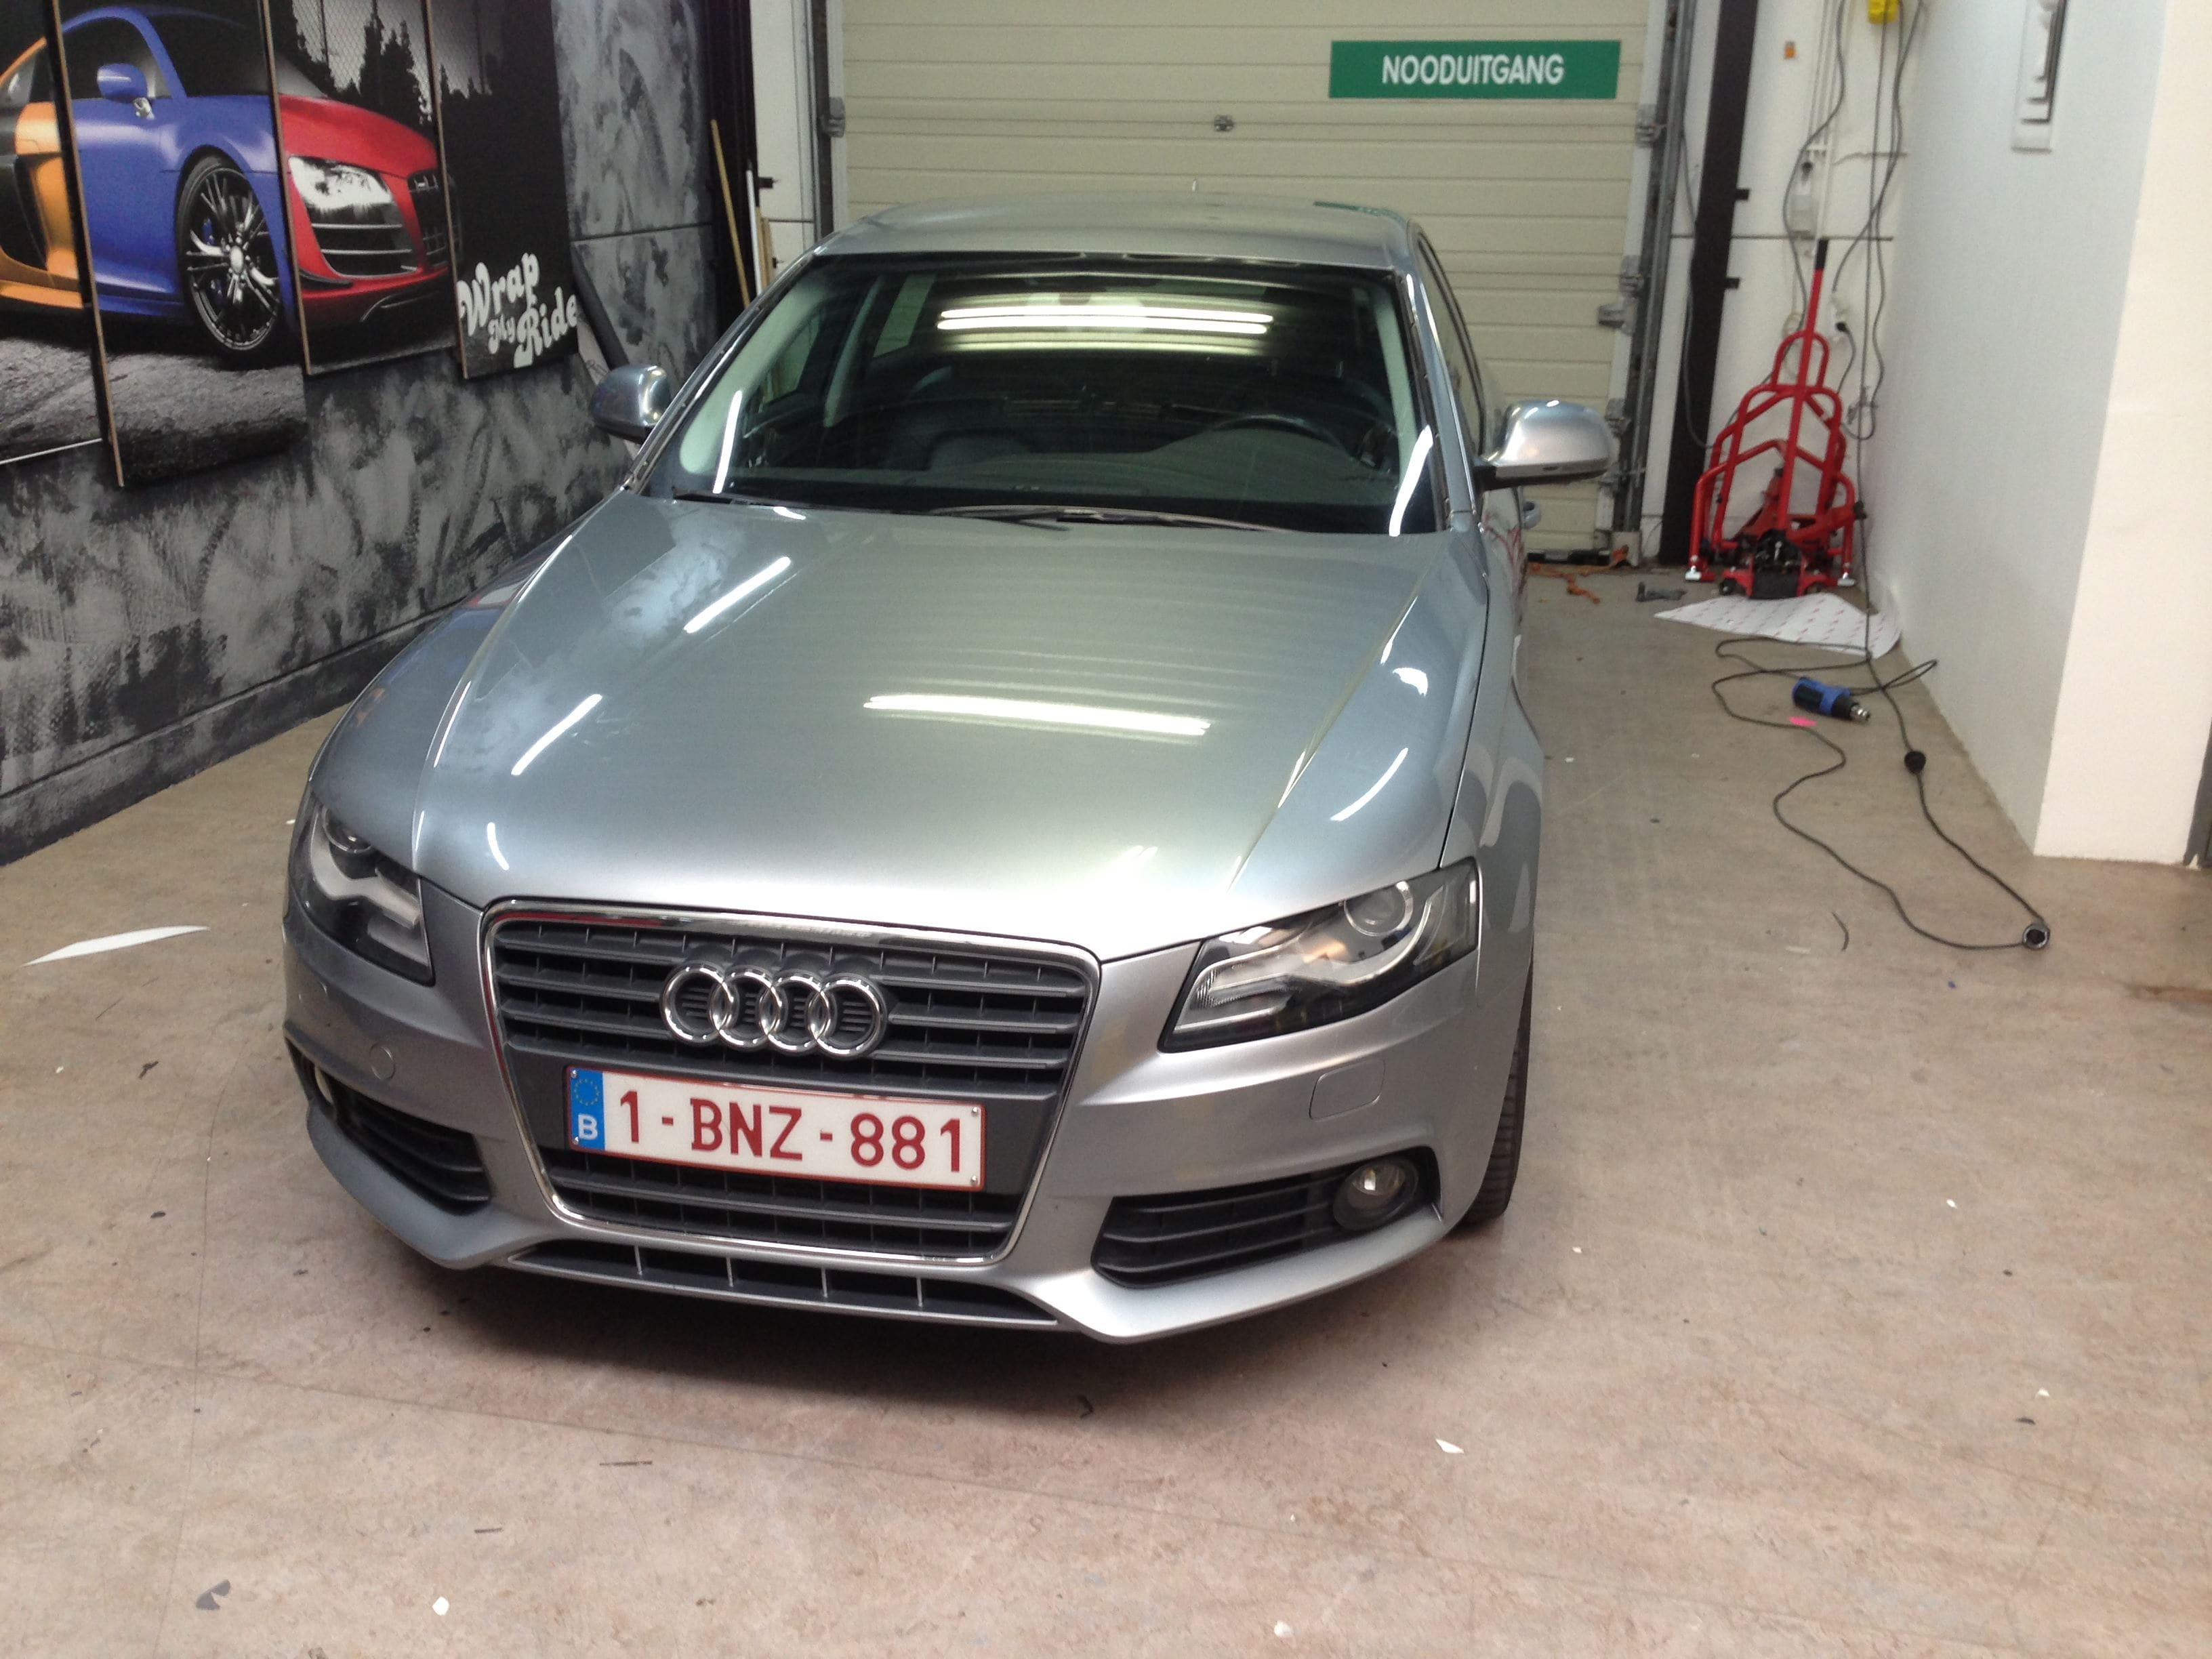 Audi A4 B6 met Gunpowder Wrap, Carwrapping door Wrapmyride.nu Foto-nr:4501, ©2021